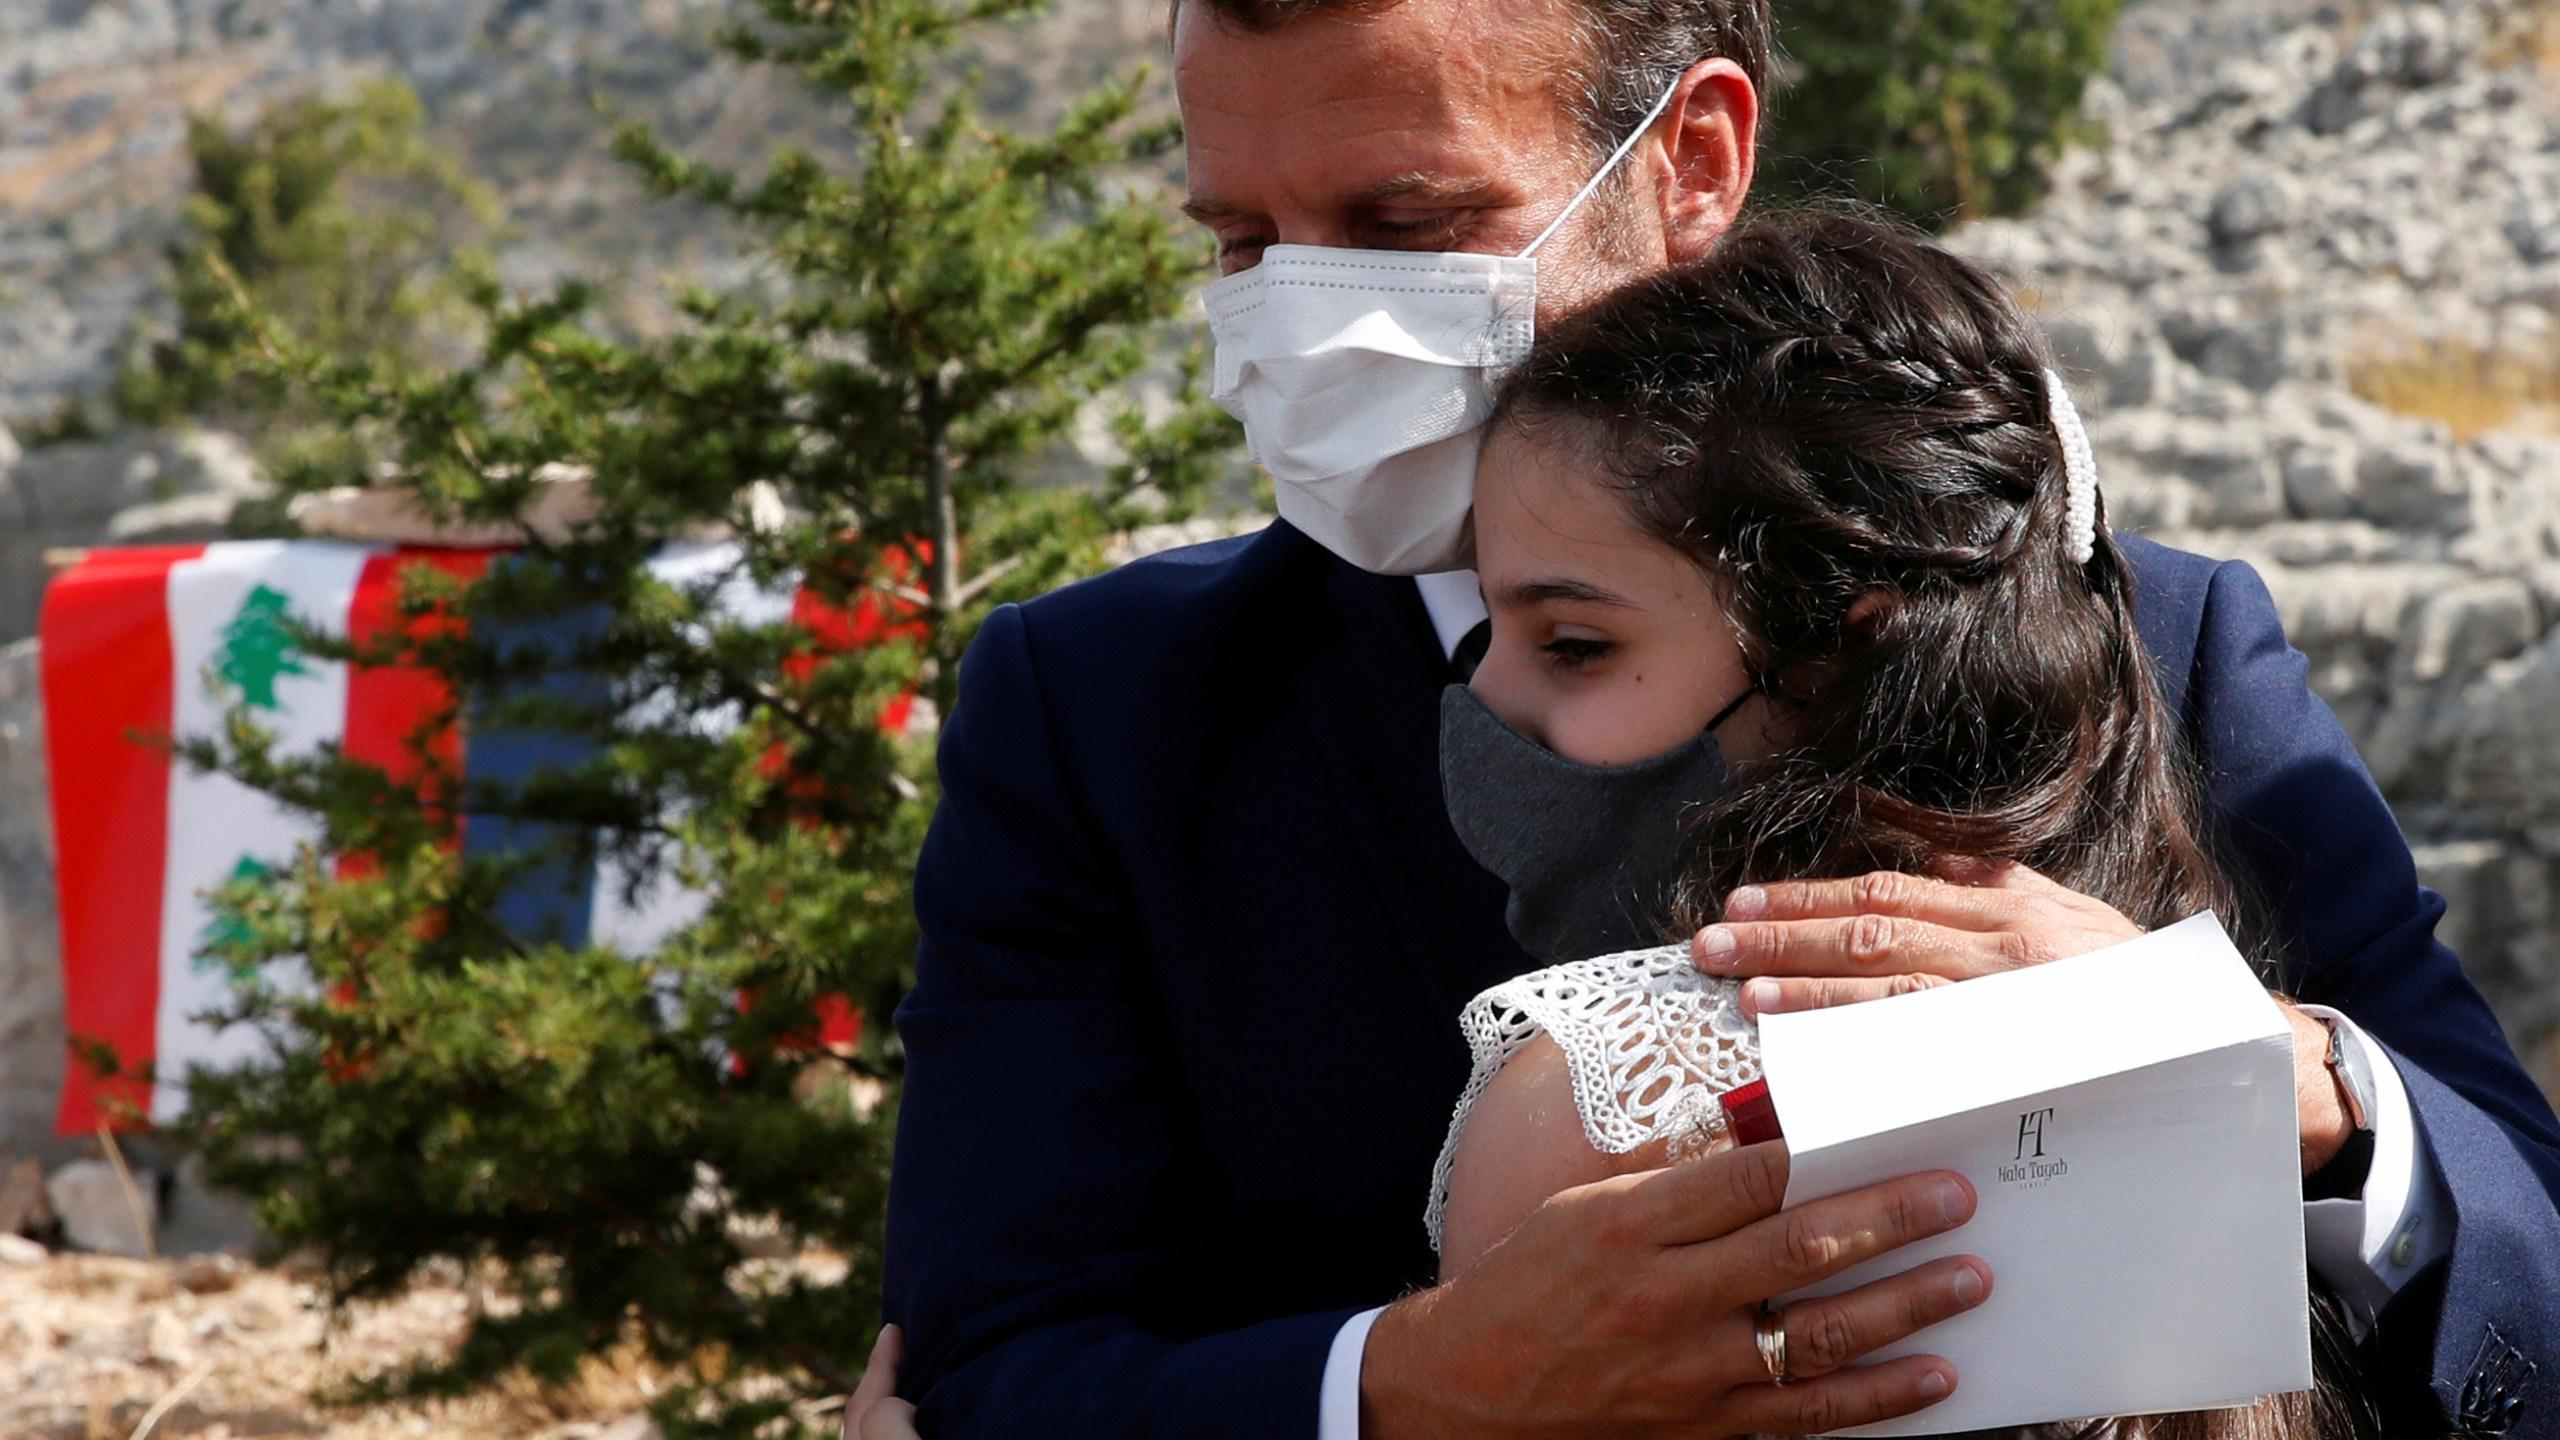 French President Emmanuel Macron visits Lebanon